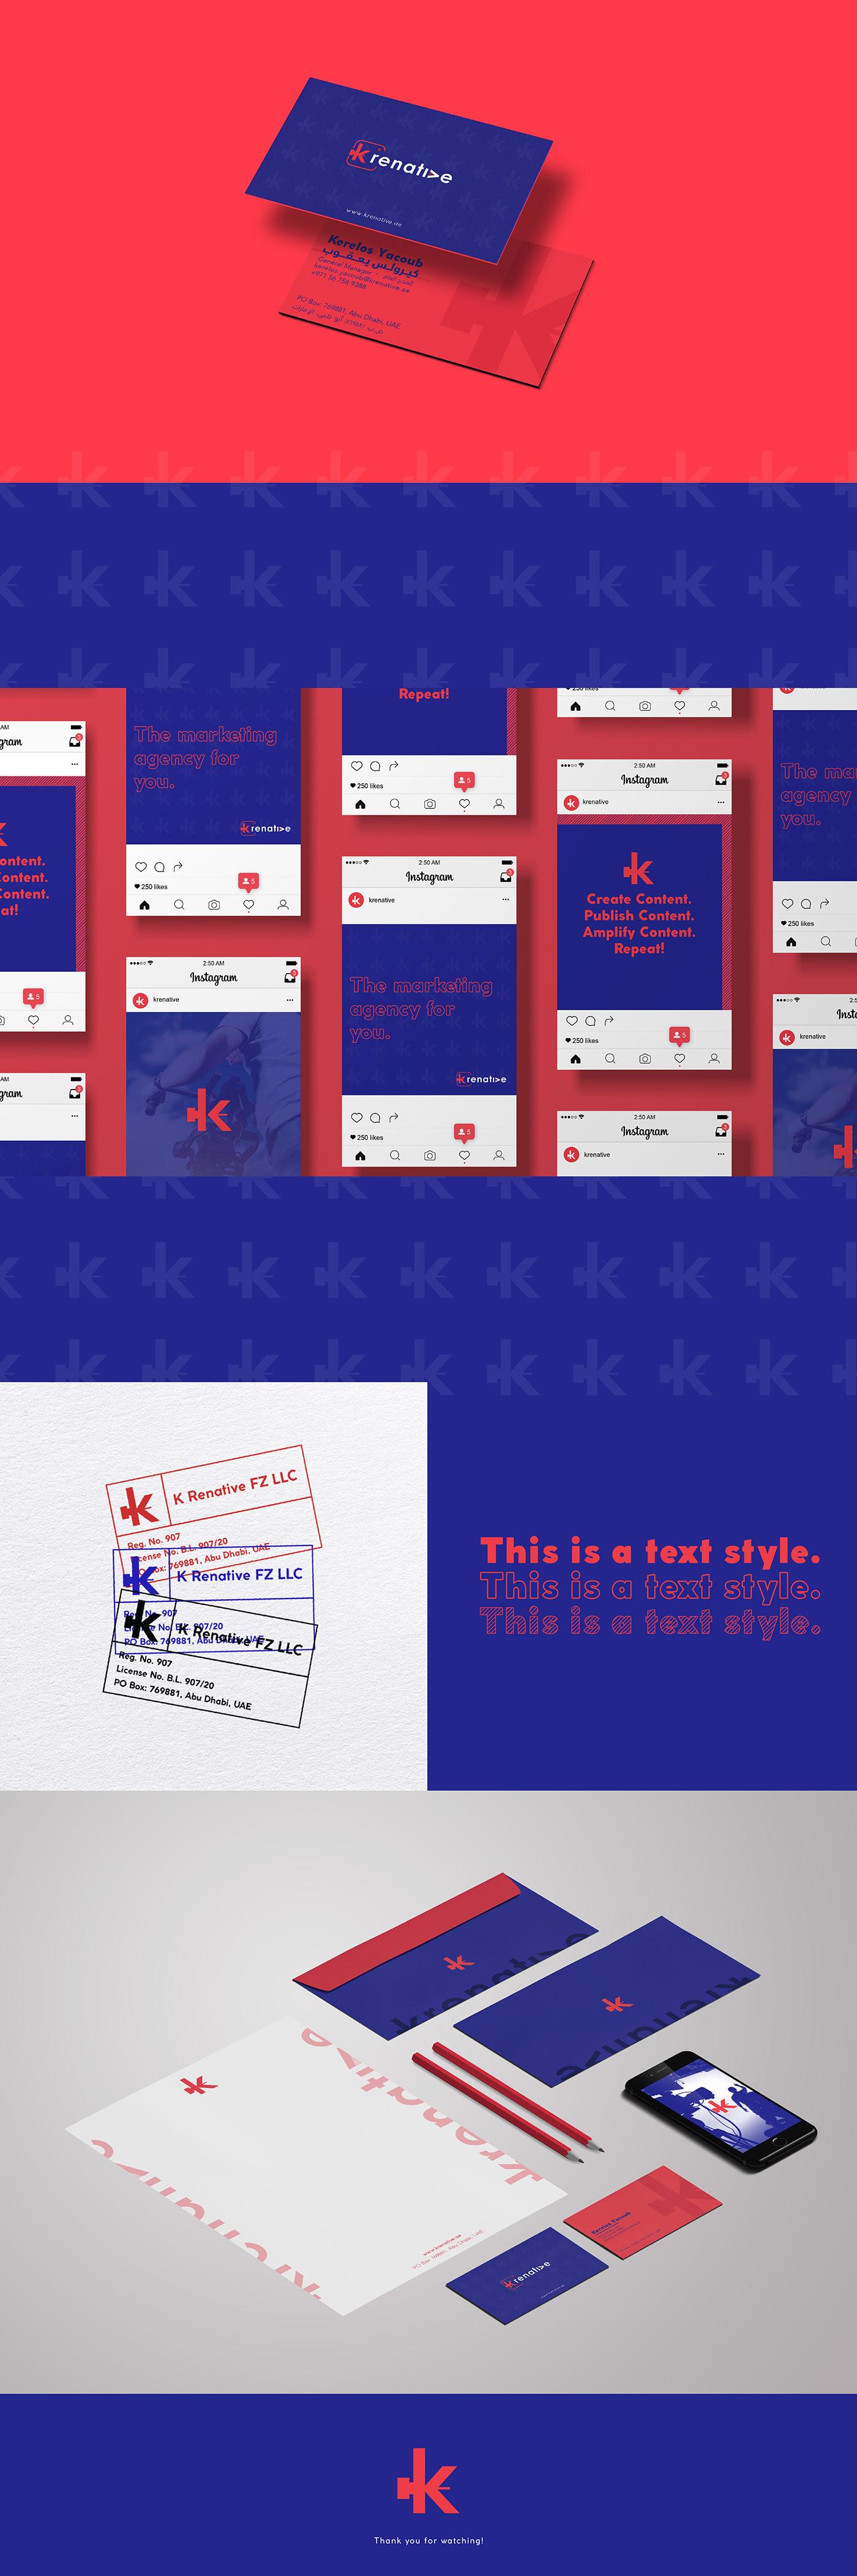 agency branding  contrast creative digital marketing natives photoshoot Pop colors videos